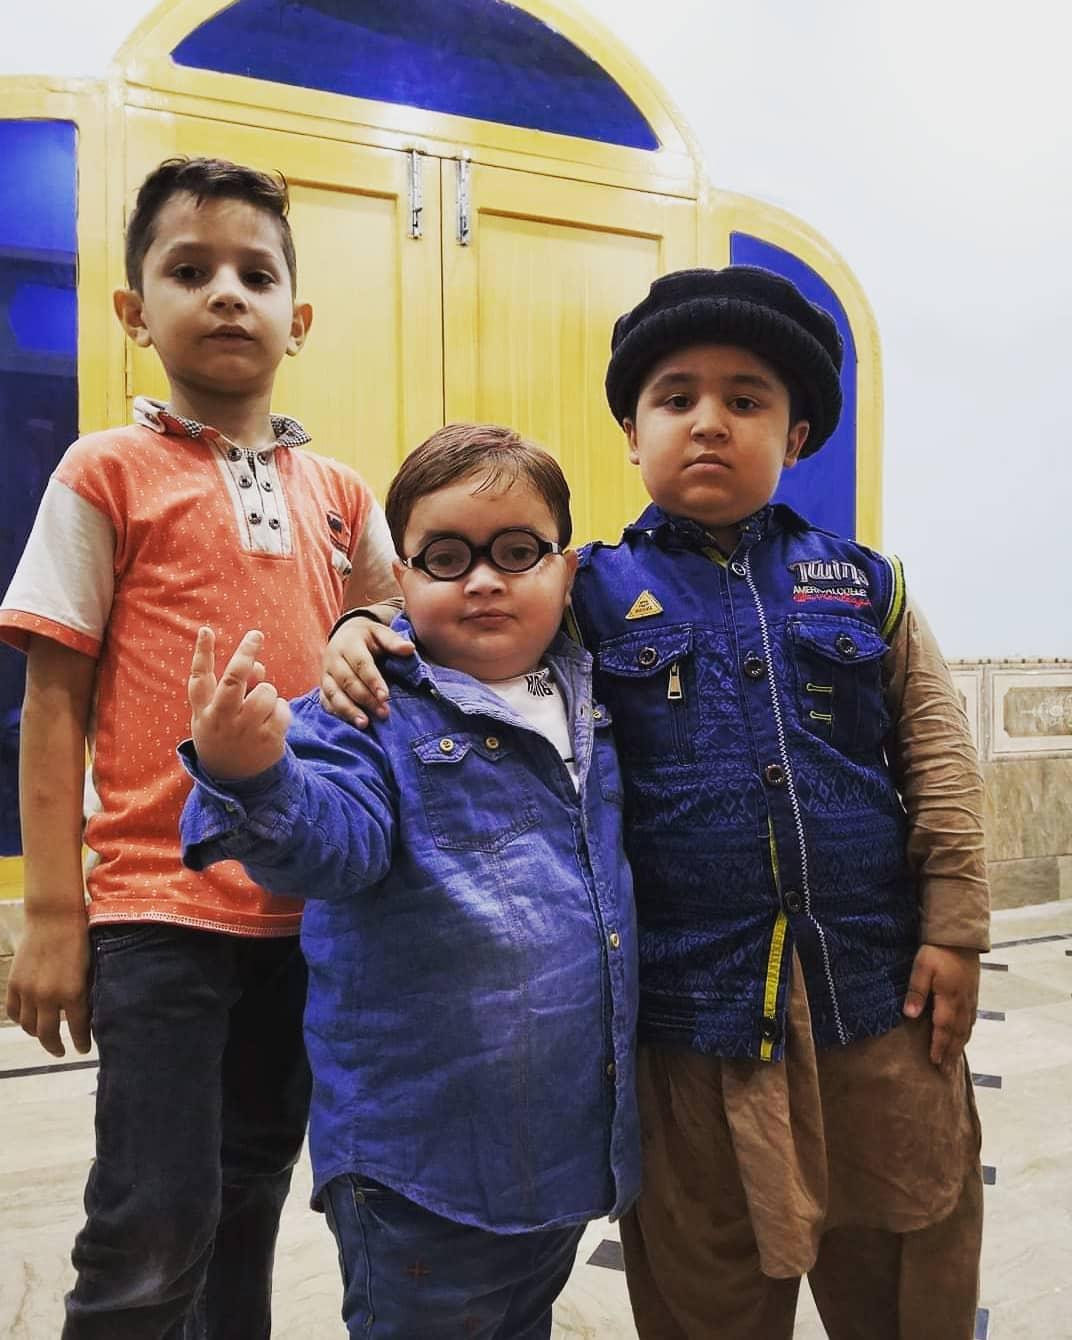 Ahmad Shah Cute Kid with his friends